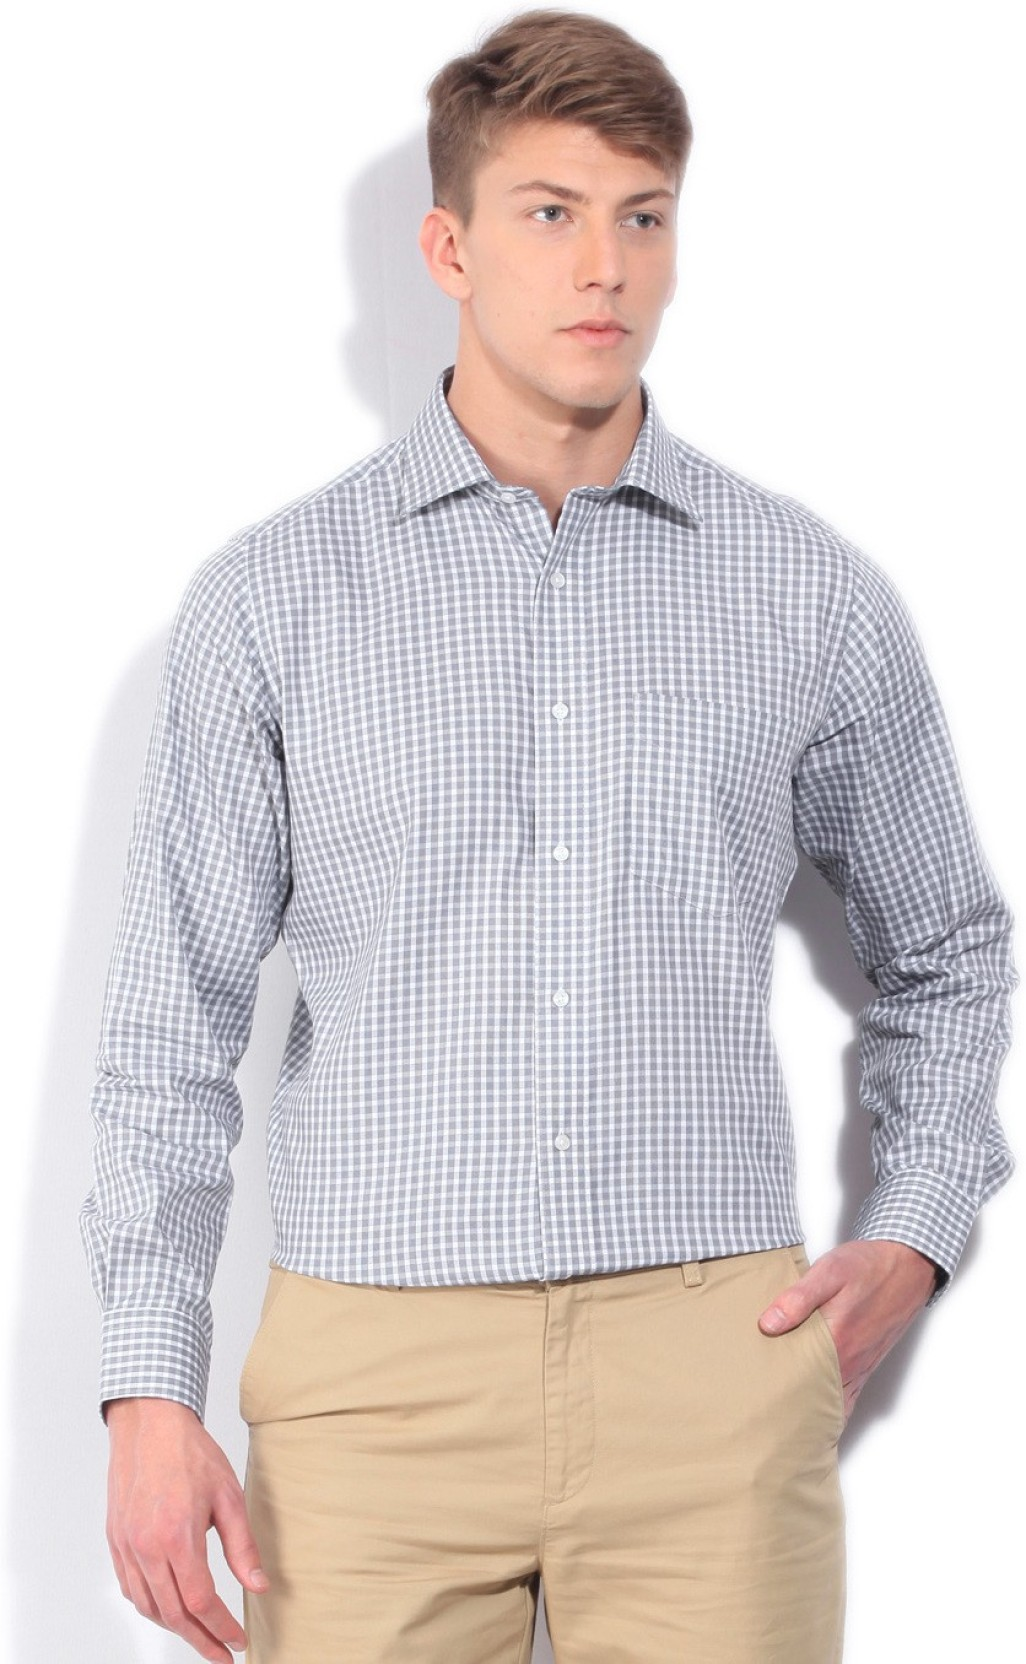 204a7159e Van Heusen Casual Shirts Online India